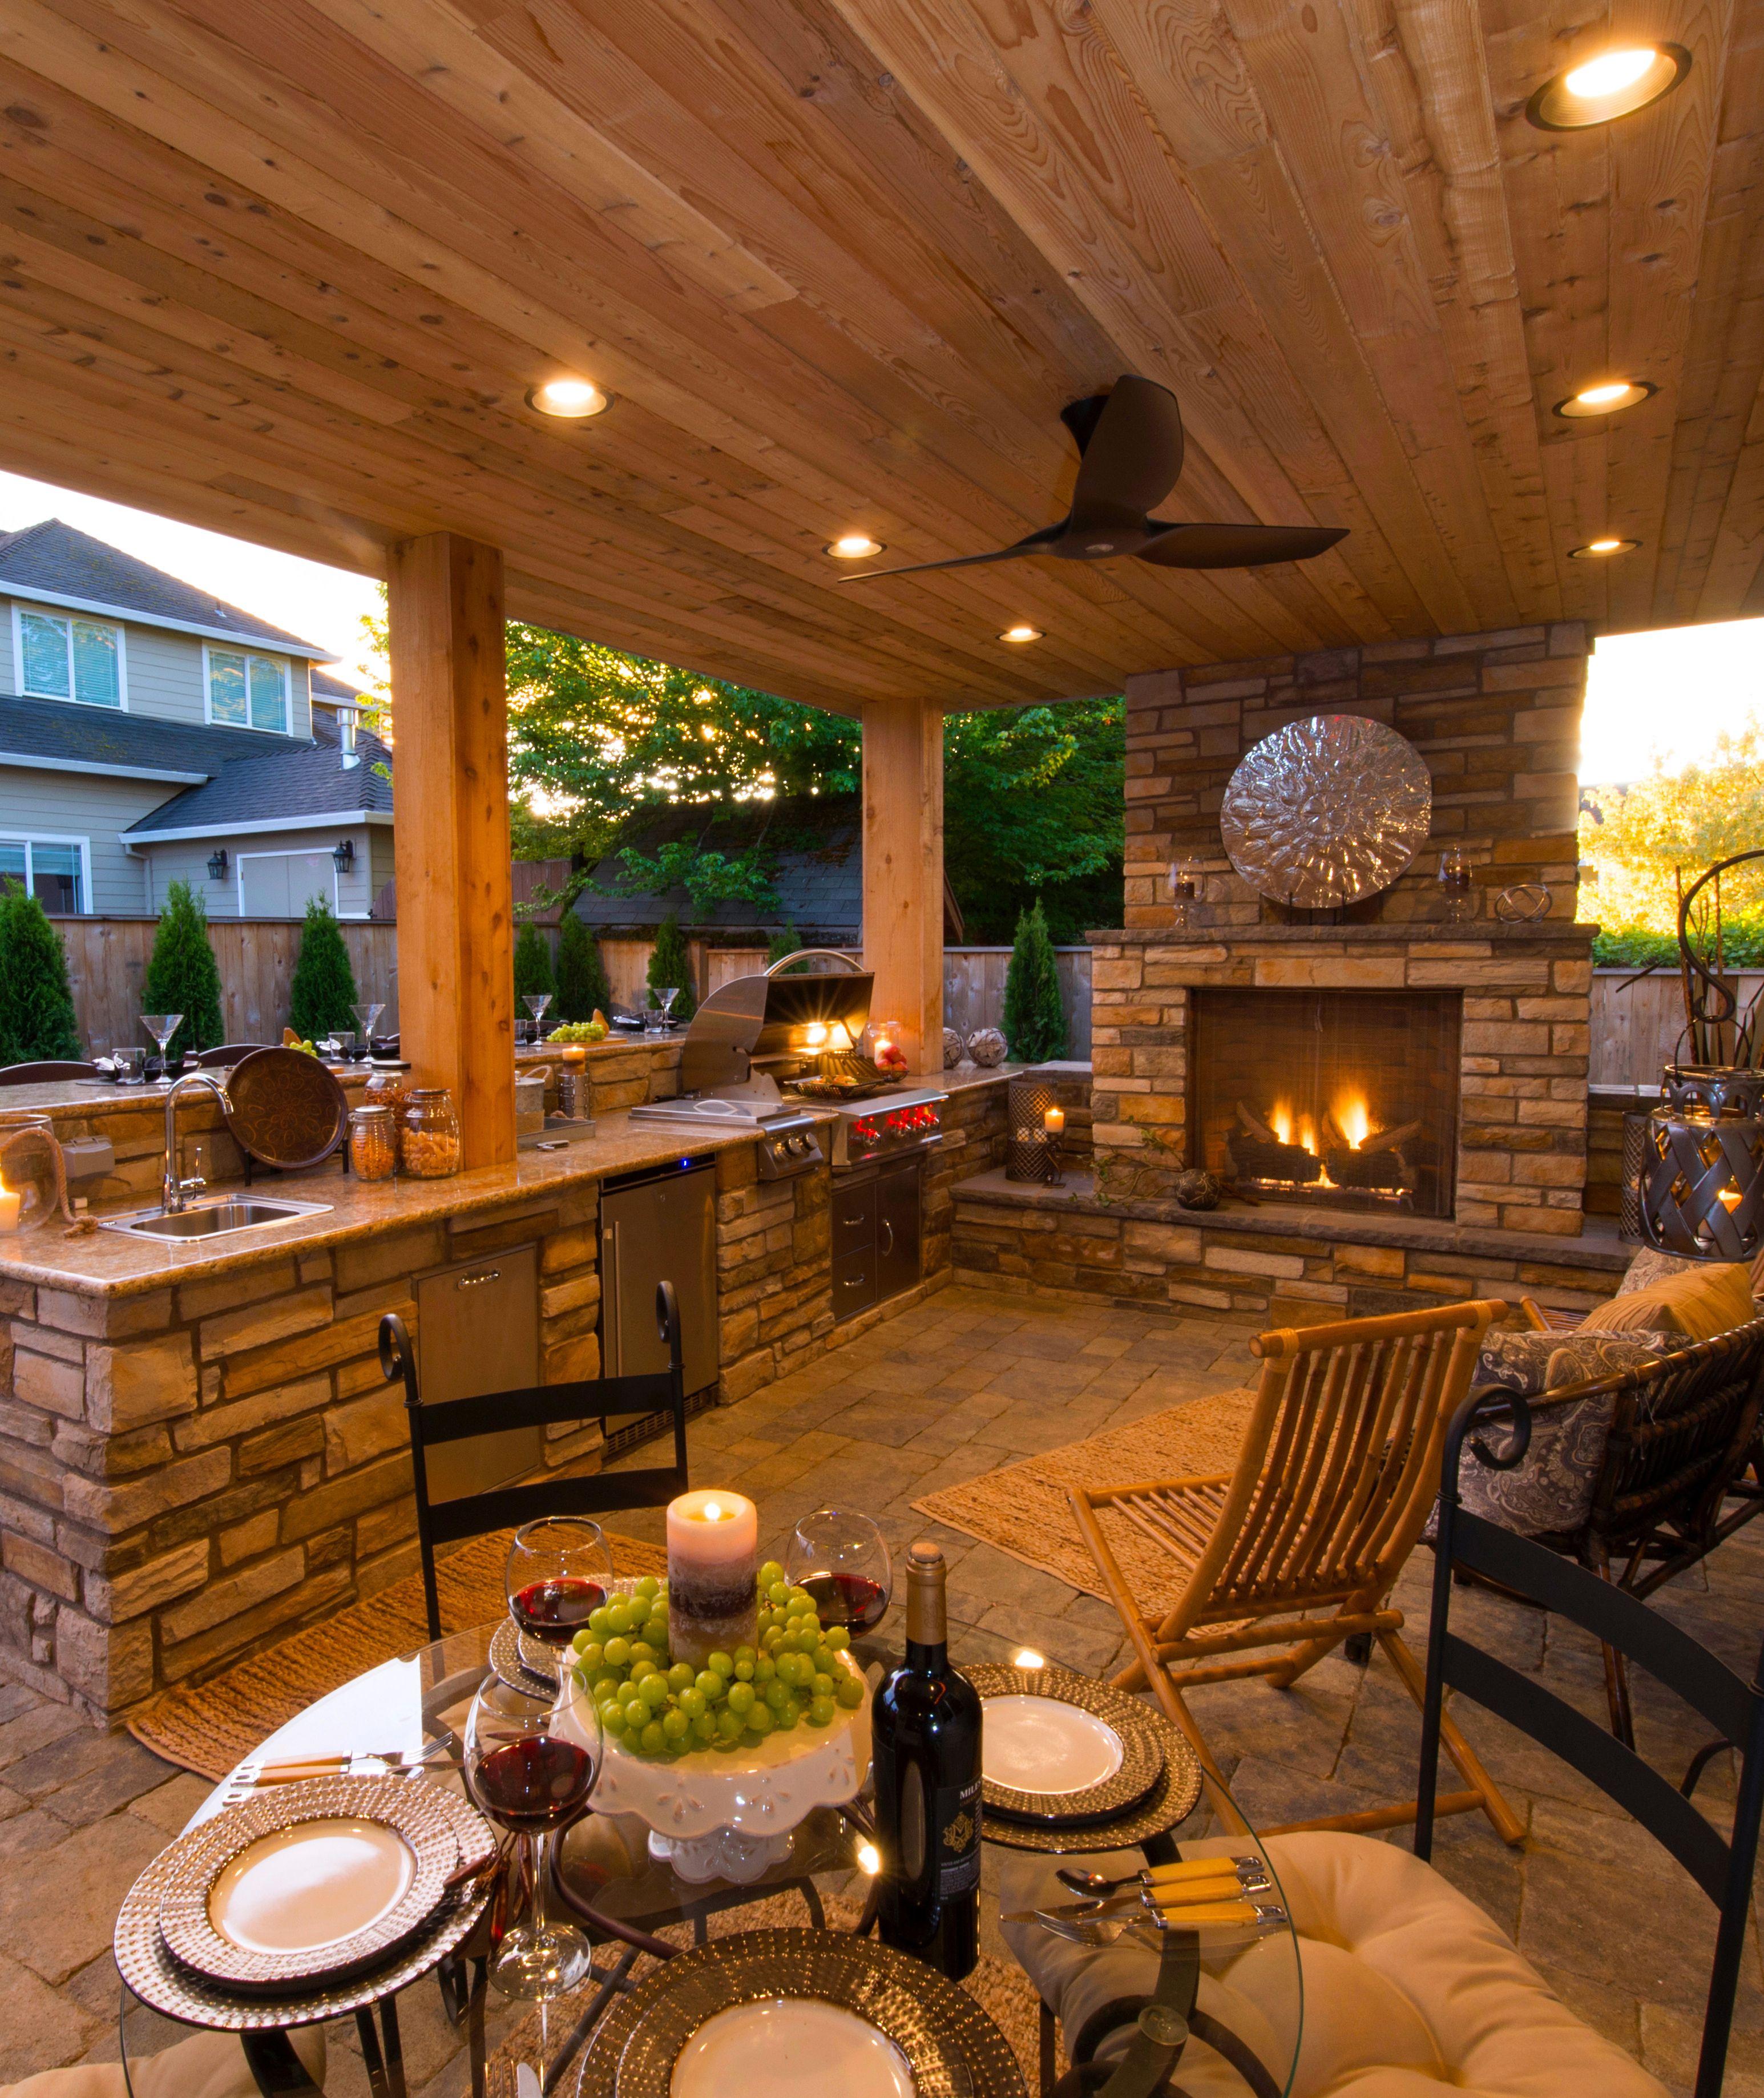 pinvalerie benton frech on outdoor space | outdoor kitchen